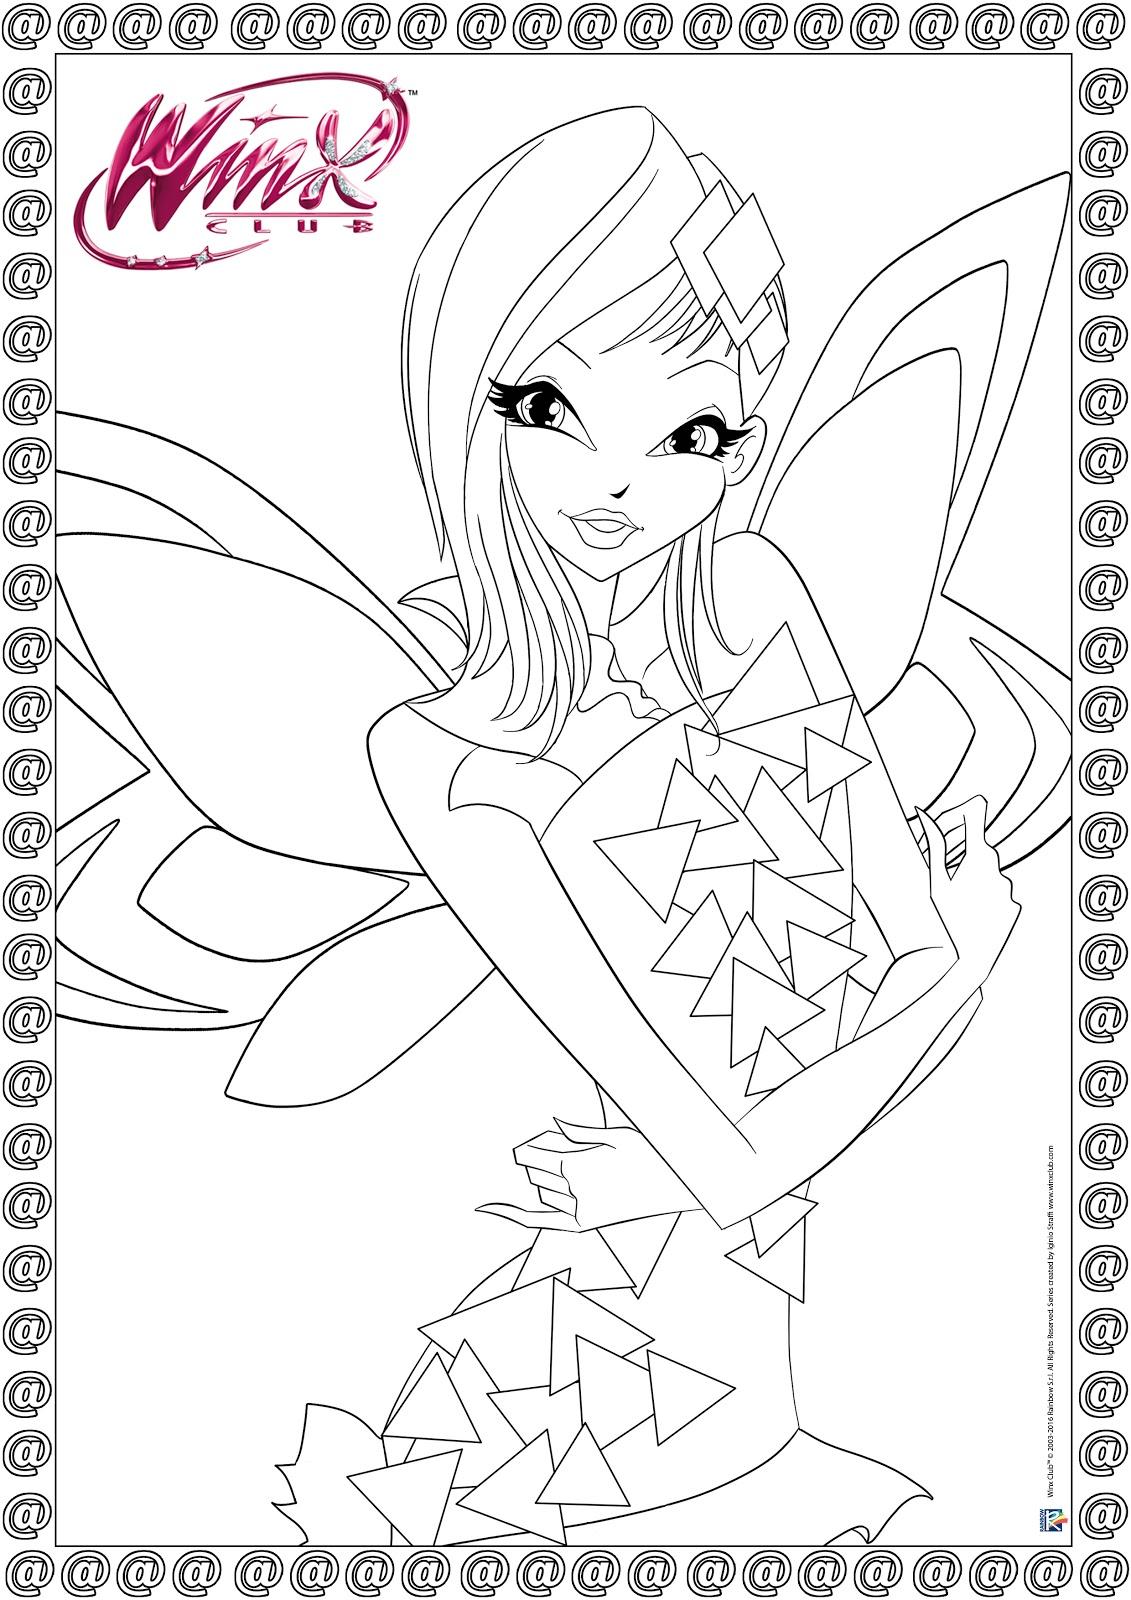 Imprime y Colorea al Winx Club Tynix ~ My Winx Club-Pretty!*.